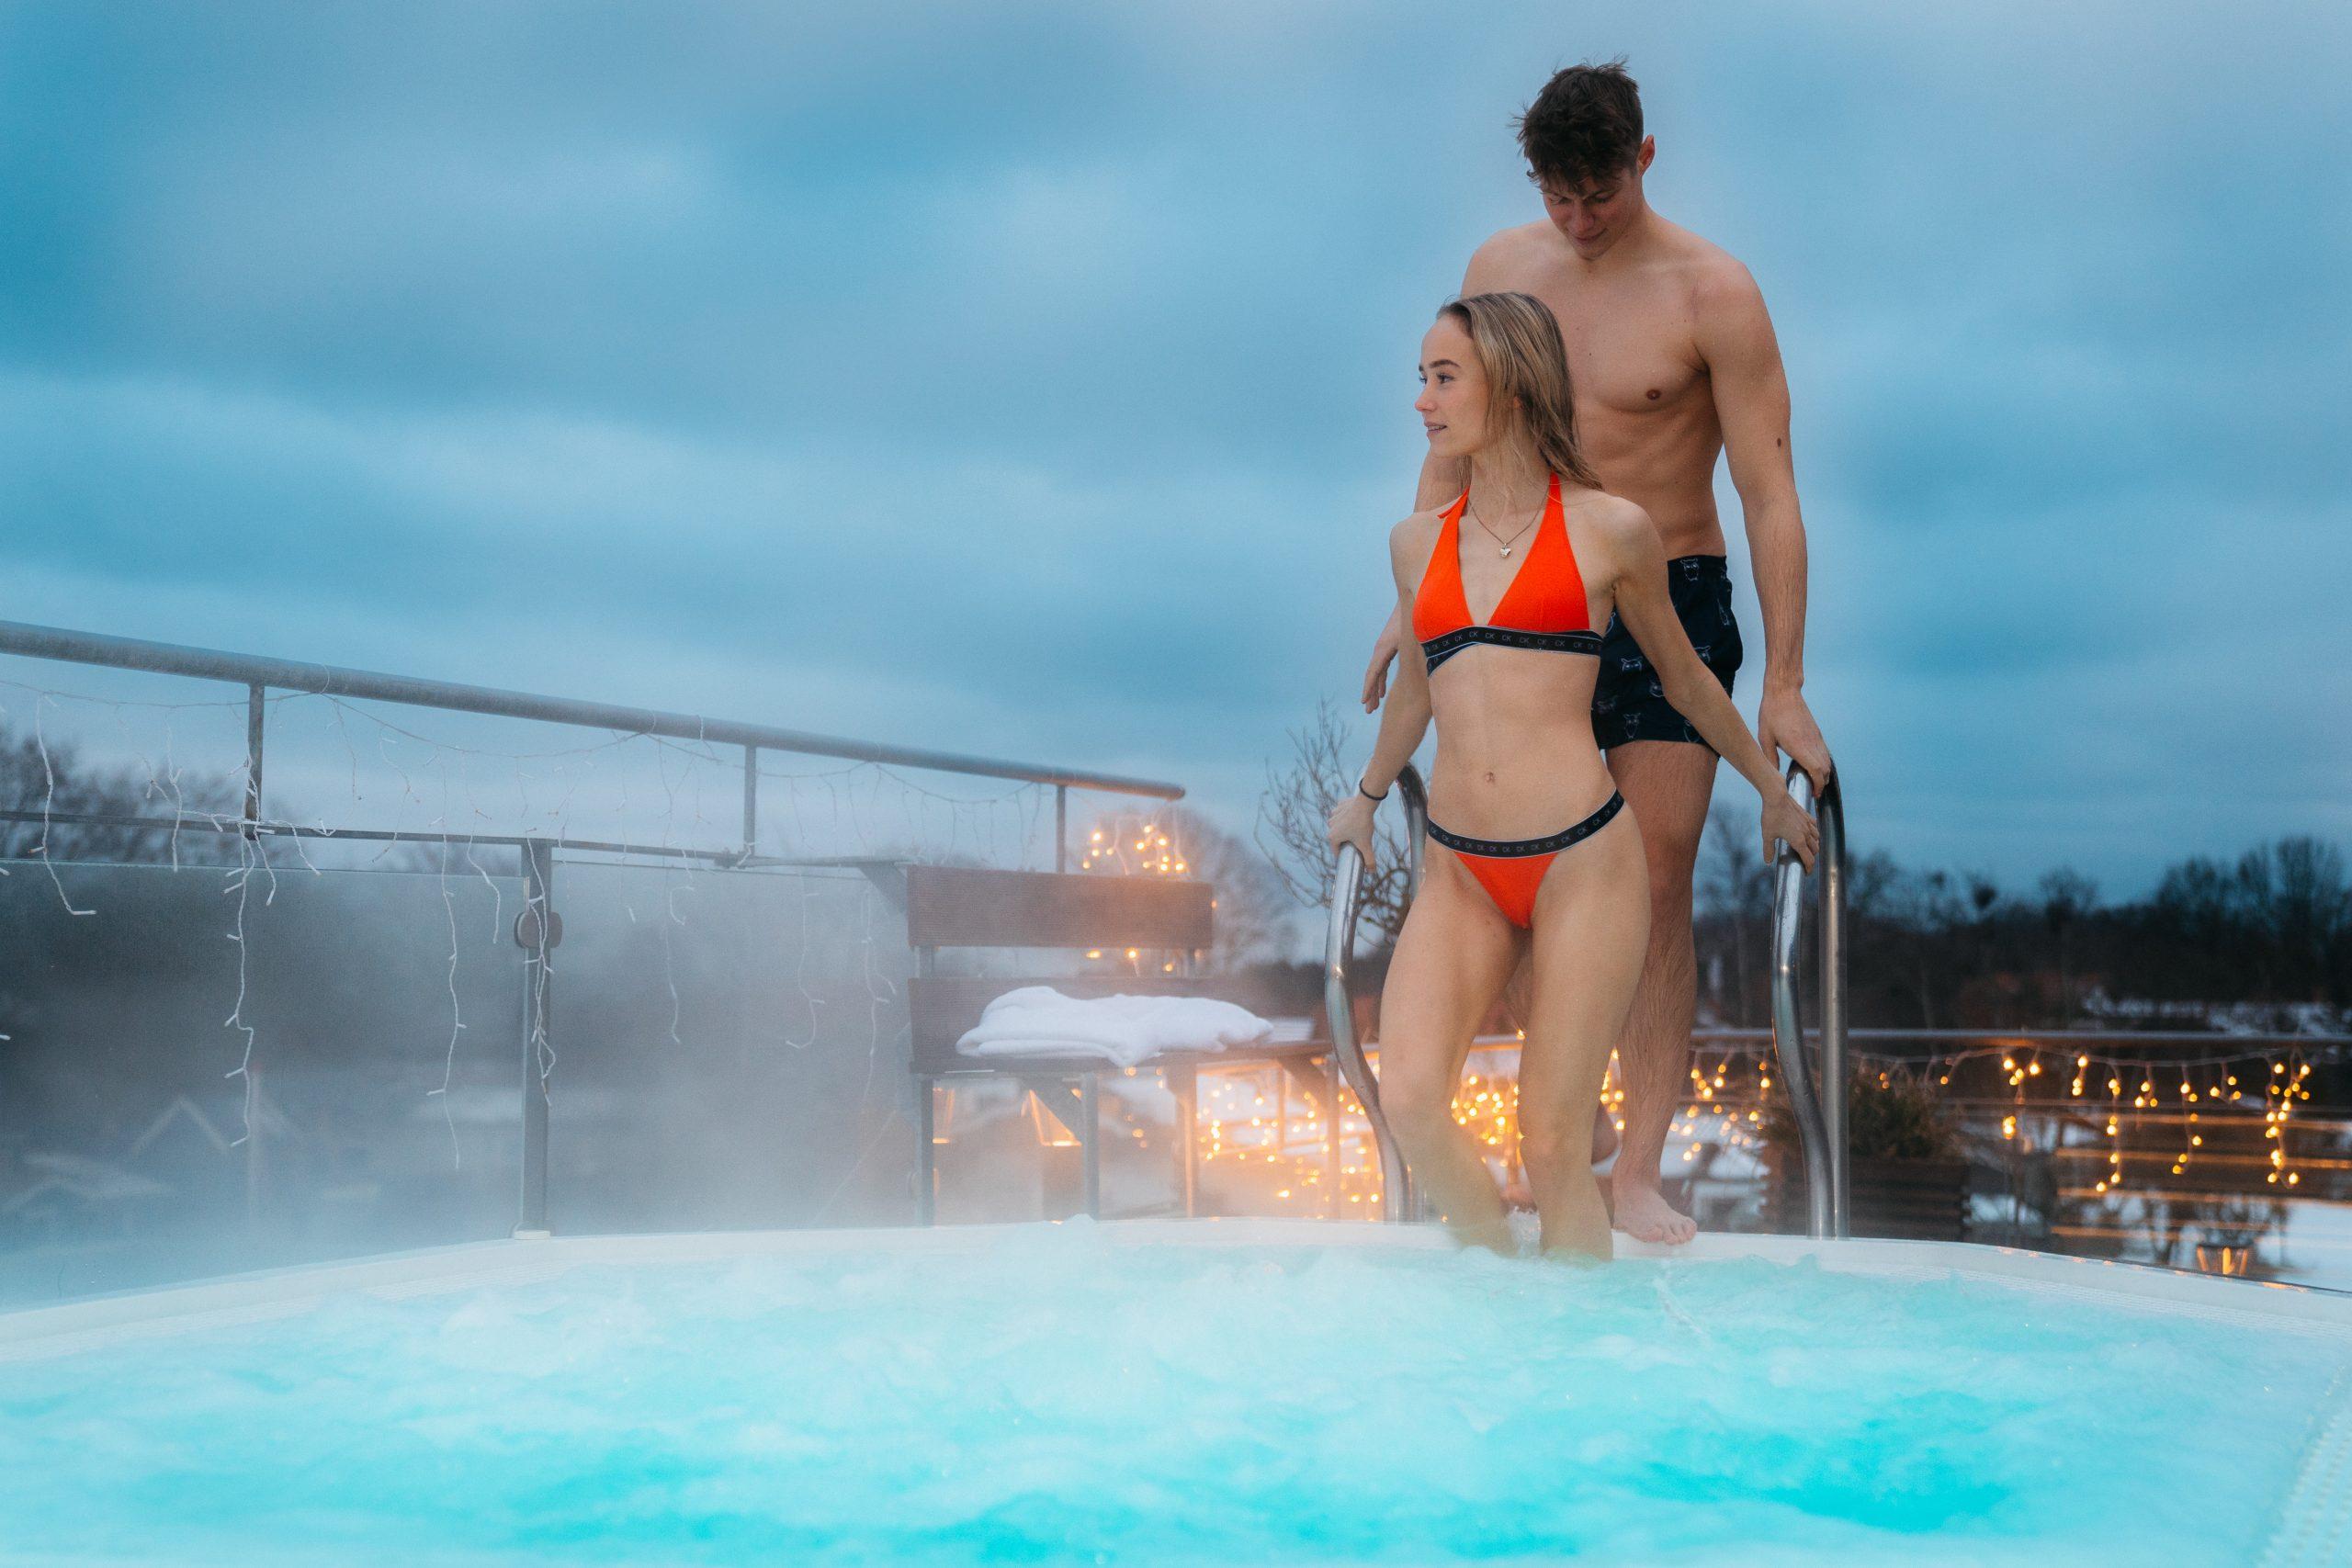 Perfekt til Mors Dag: Hotel Viking er klar til genåbning med vilde tilbud